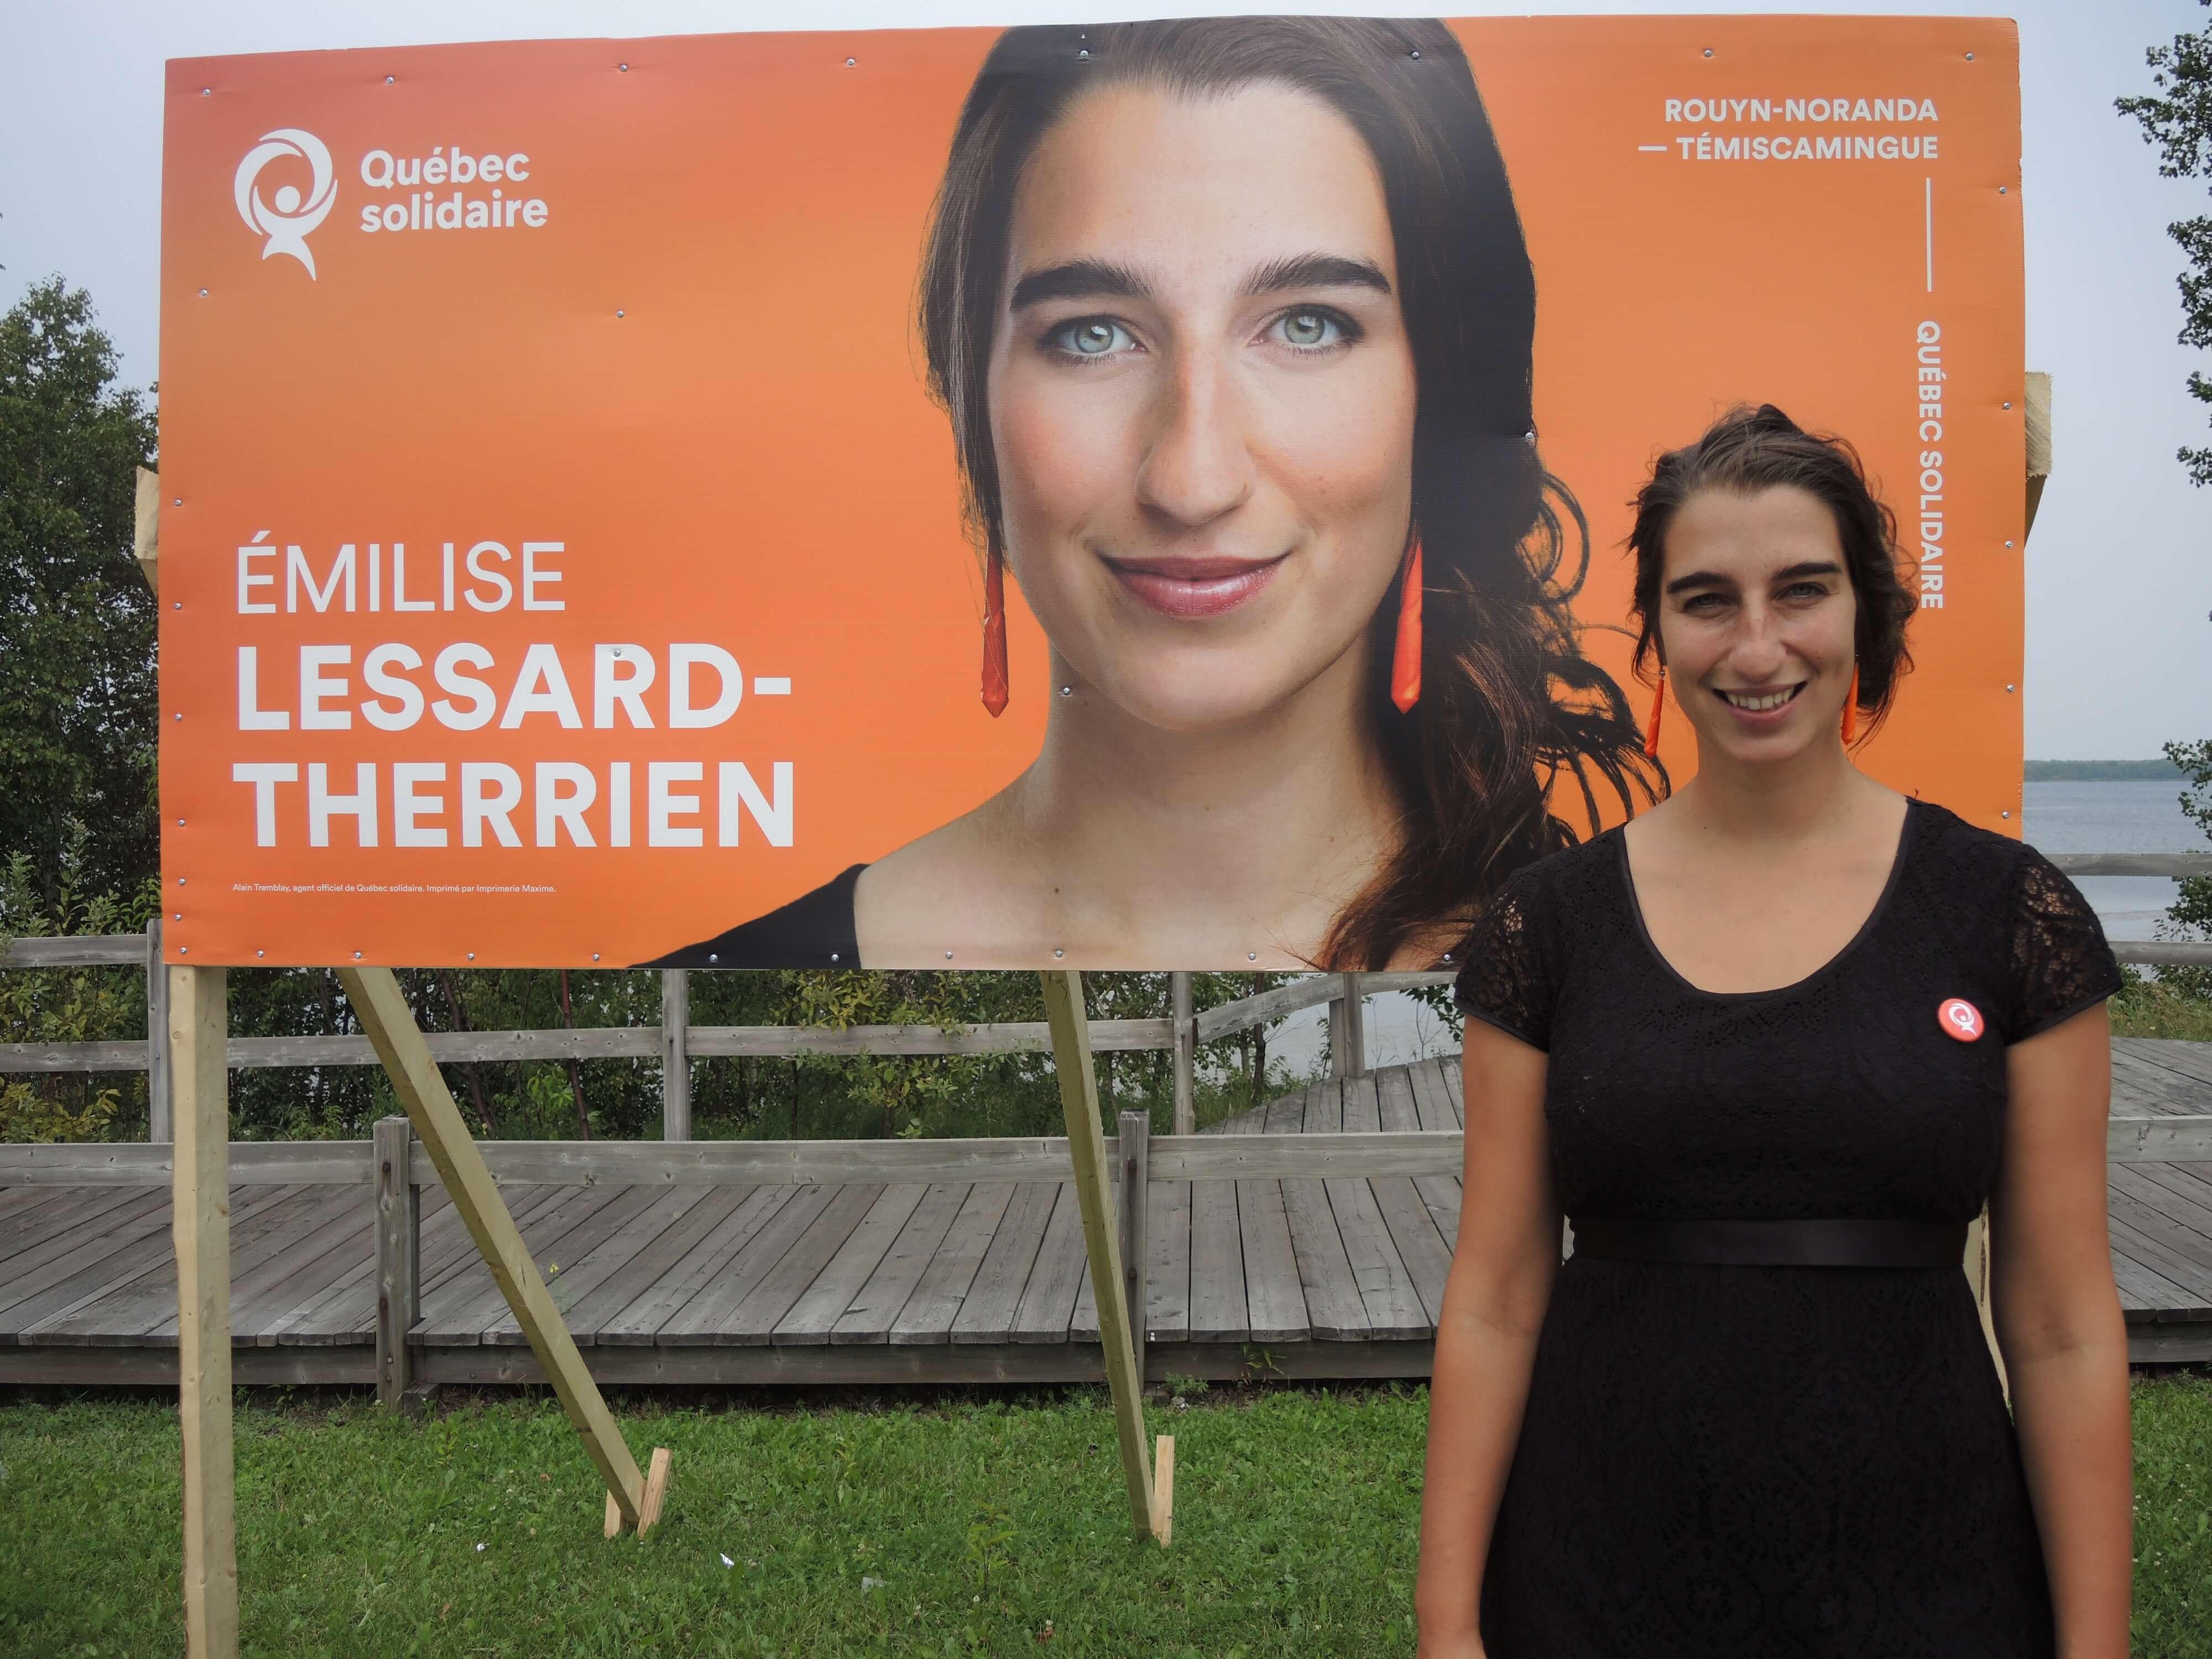 Émilise Lessard-Therrien